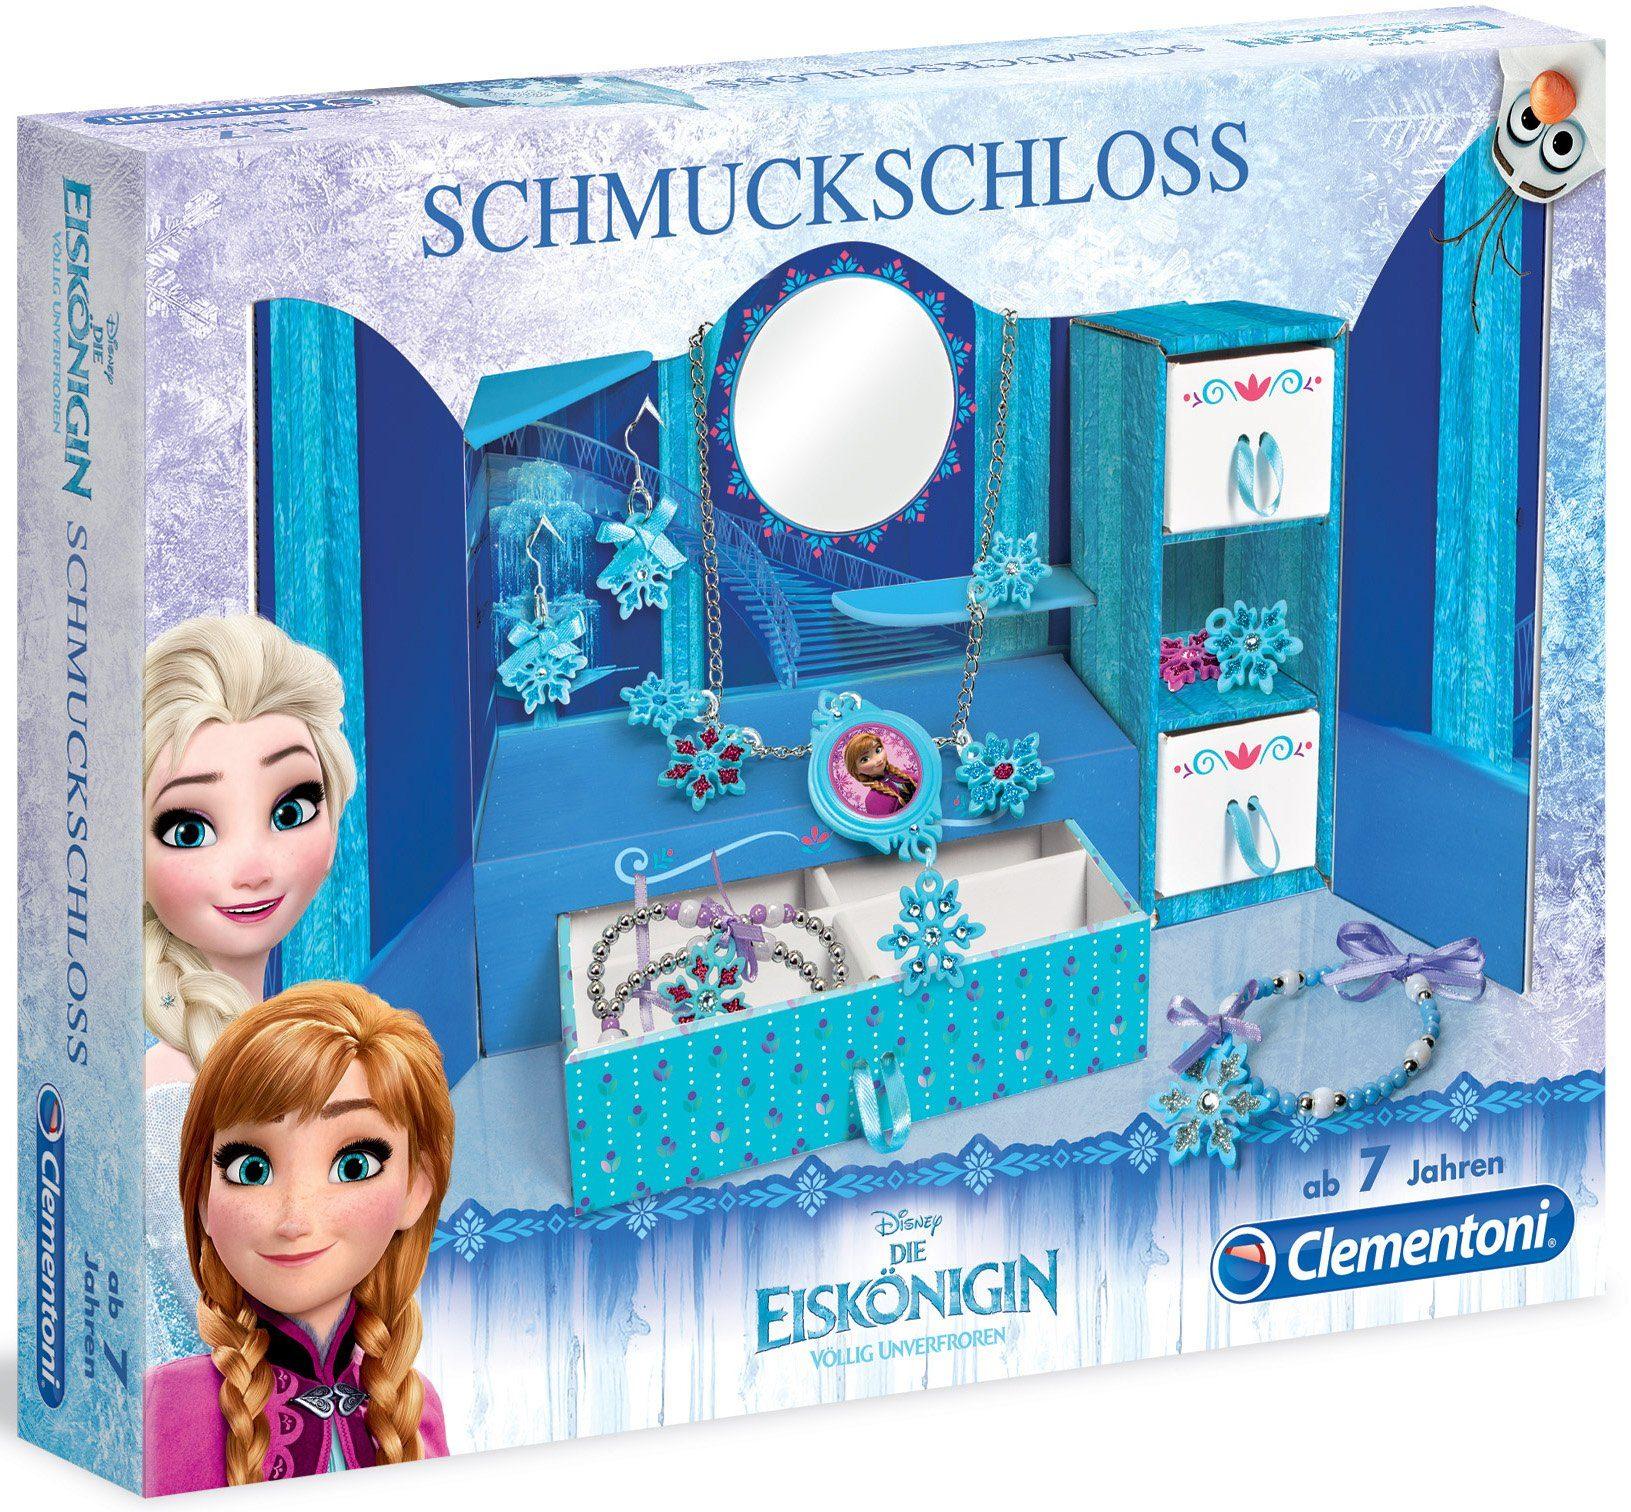 Clementoni Kreativset, »Disney Die Eiskönigin Völlig unverfroren Schmuckschloss«